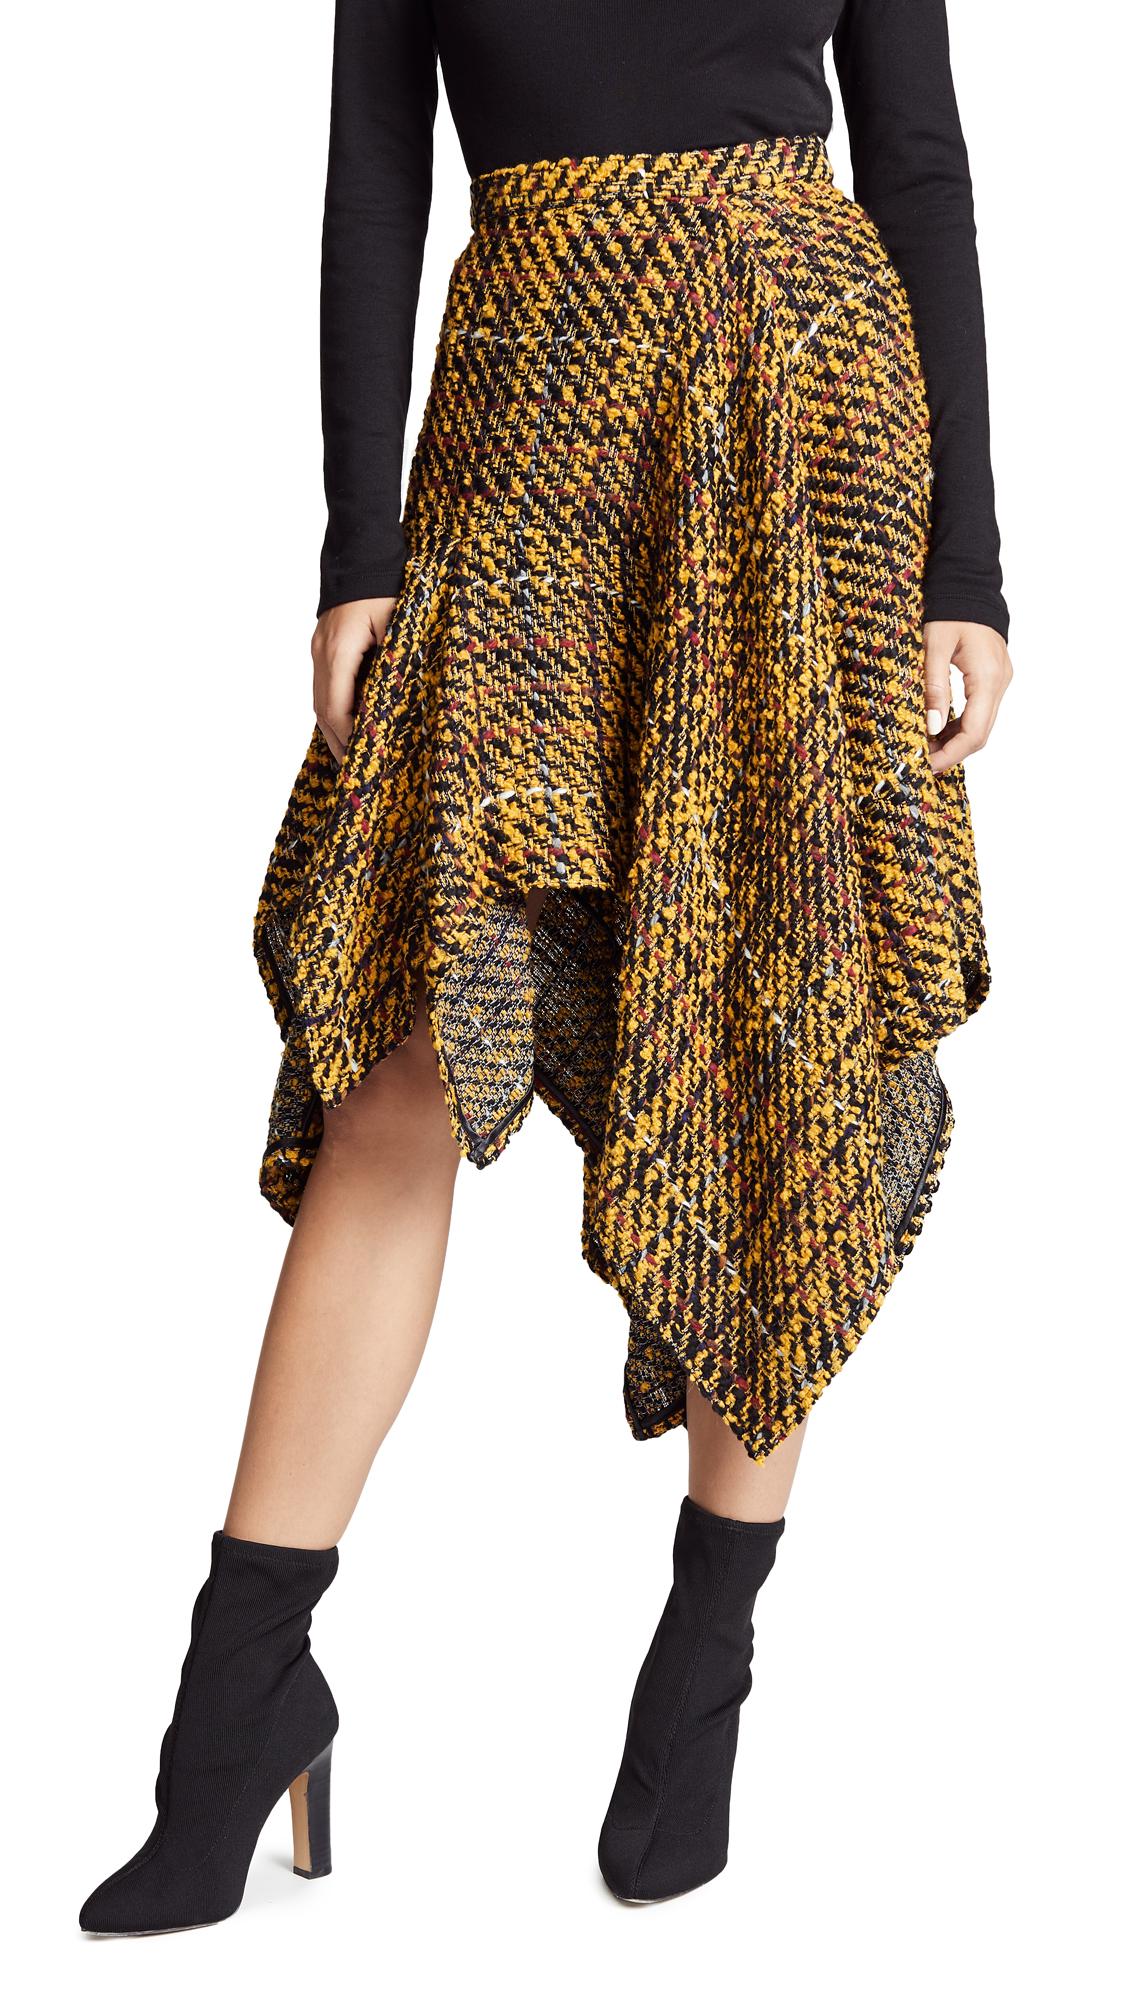 Koche Asymmetrical Skirt - Yellow/Black